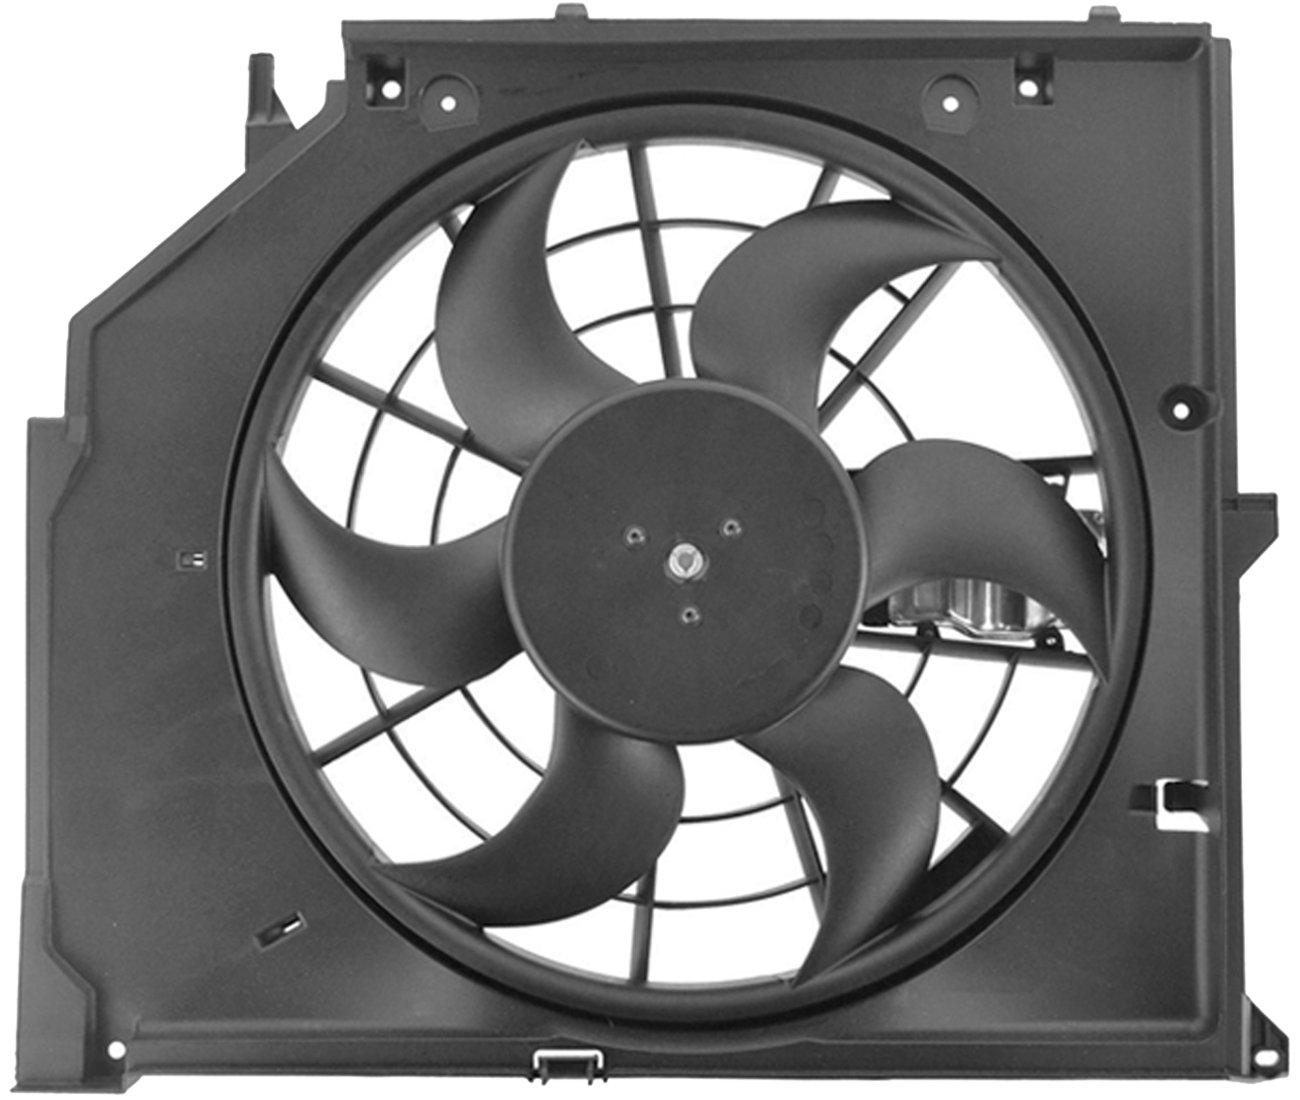 amazon topaz 17117561757 e46 radiator cooling fan assembly for 1996 BMW 328Is Review amazon topaz 17117561757 e46 radiator cooling fan assembly for bmw 323i 325i 325xi 328i 330i automotive